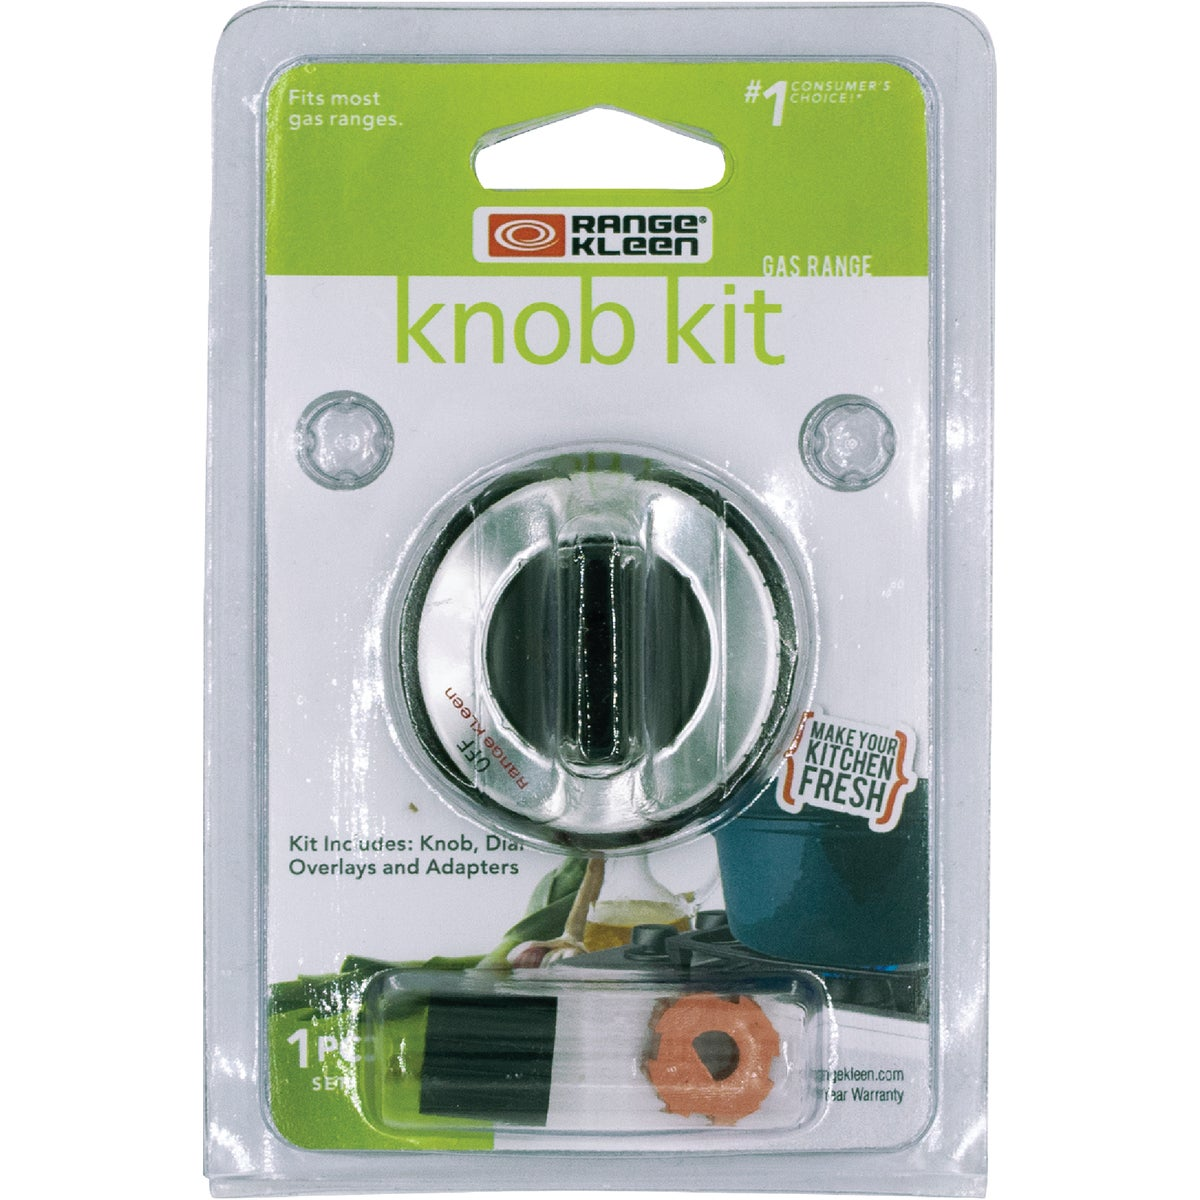 BLACK GAS KNOB KIT - 8211 by Range Kleen Mfg Inc